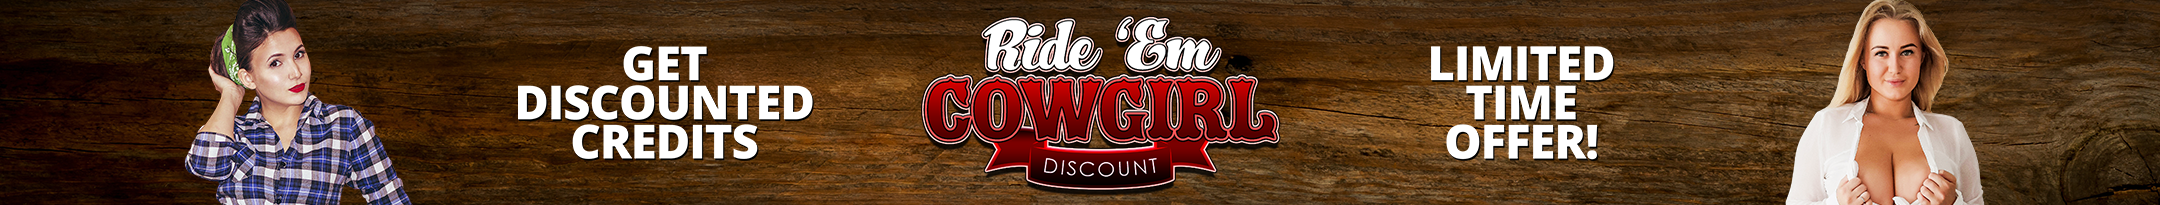 Ride Em Cowgirl Discount Promo